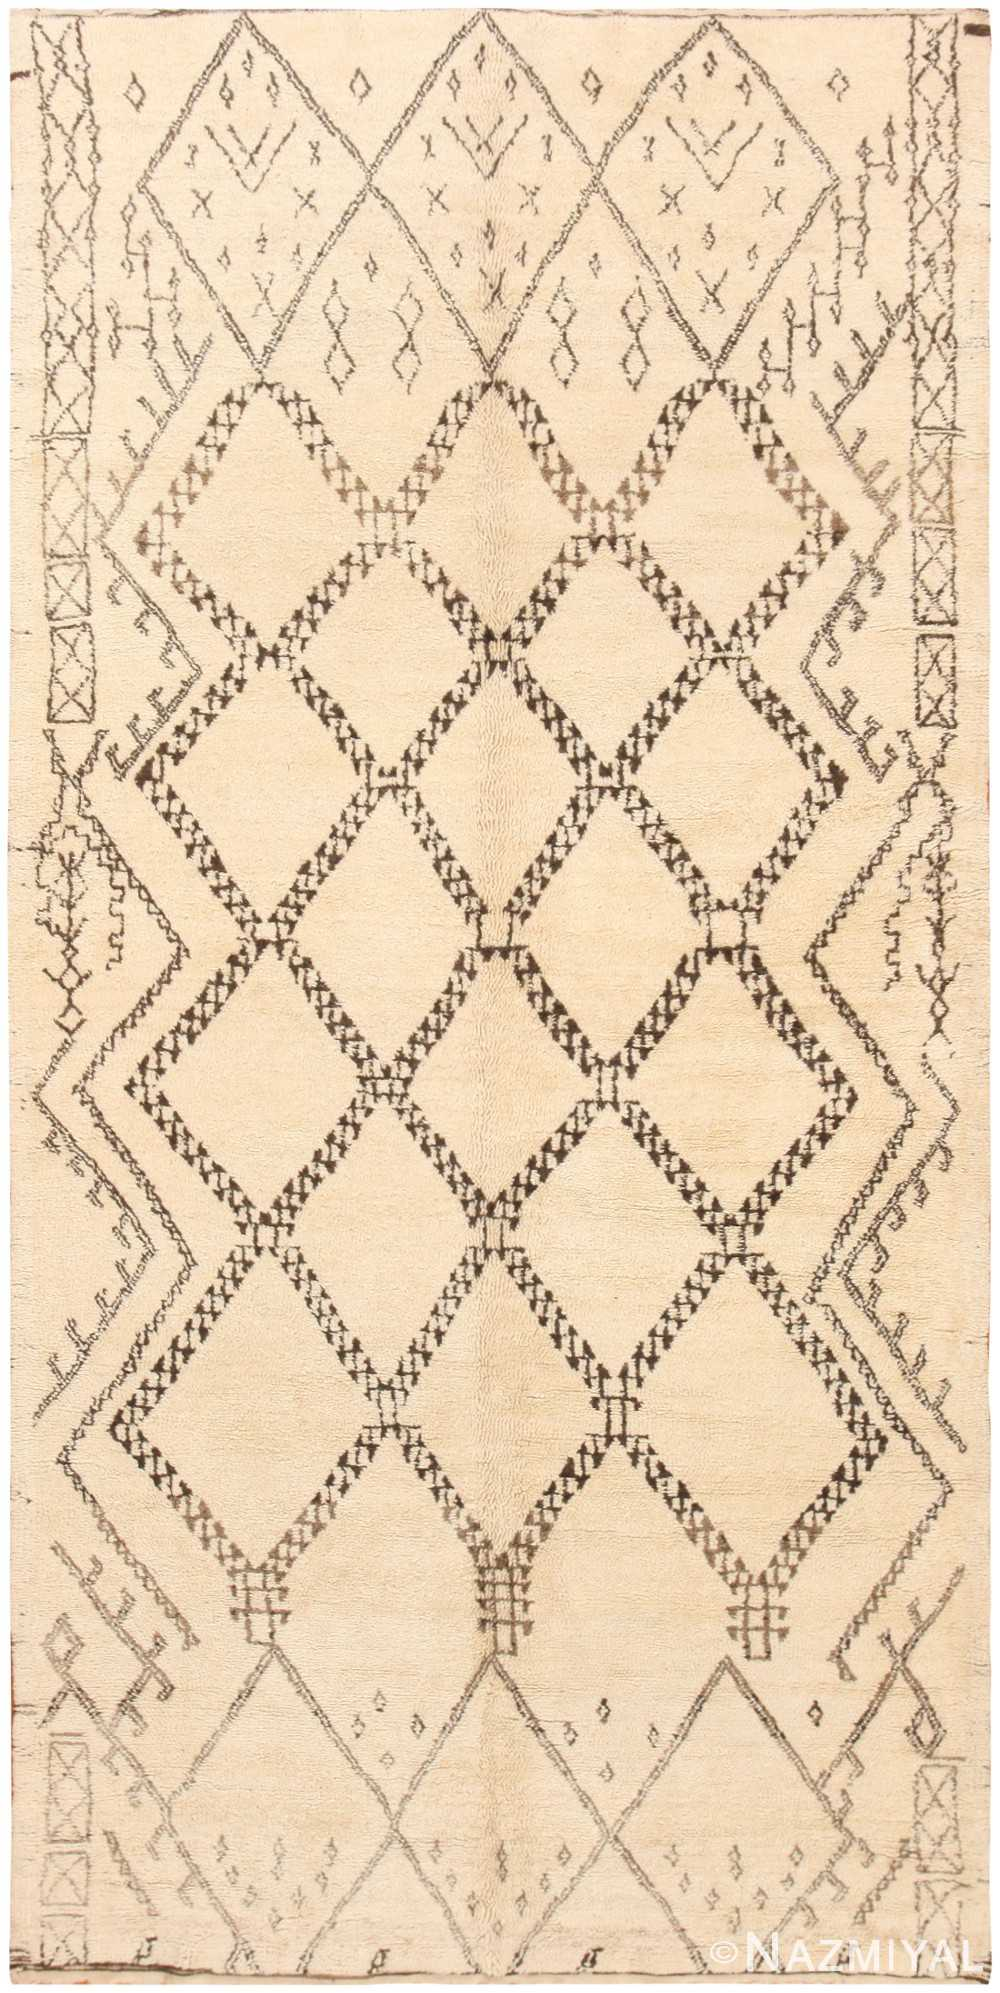 Vintage Moroccan Rug 47105 Detail/Large View